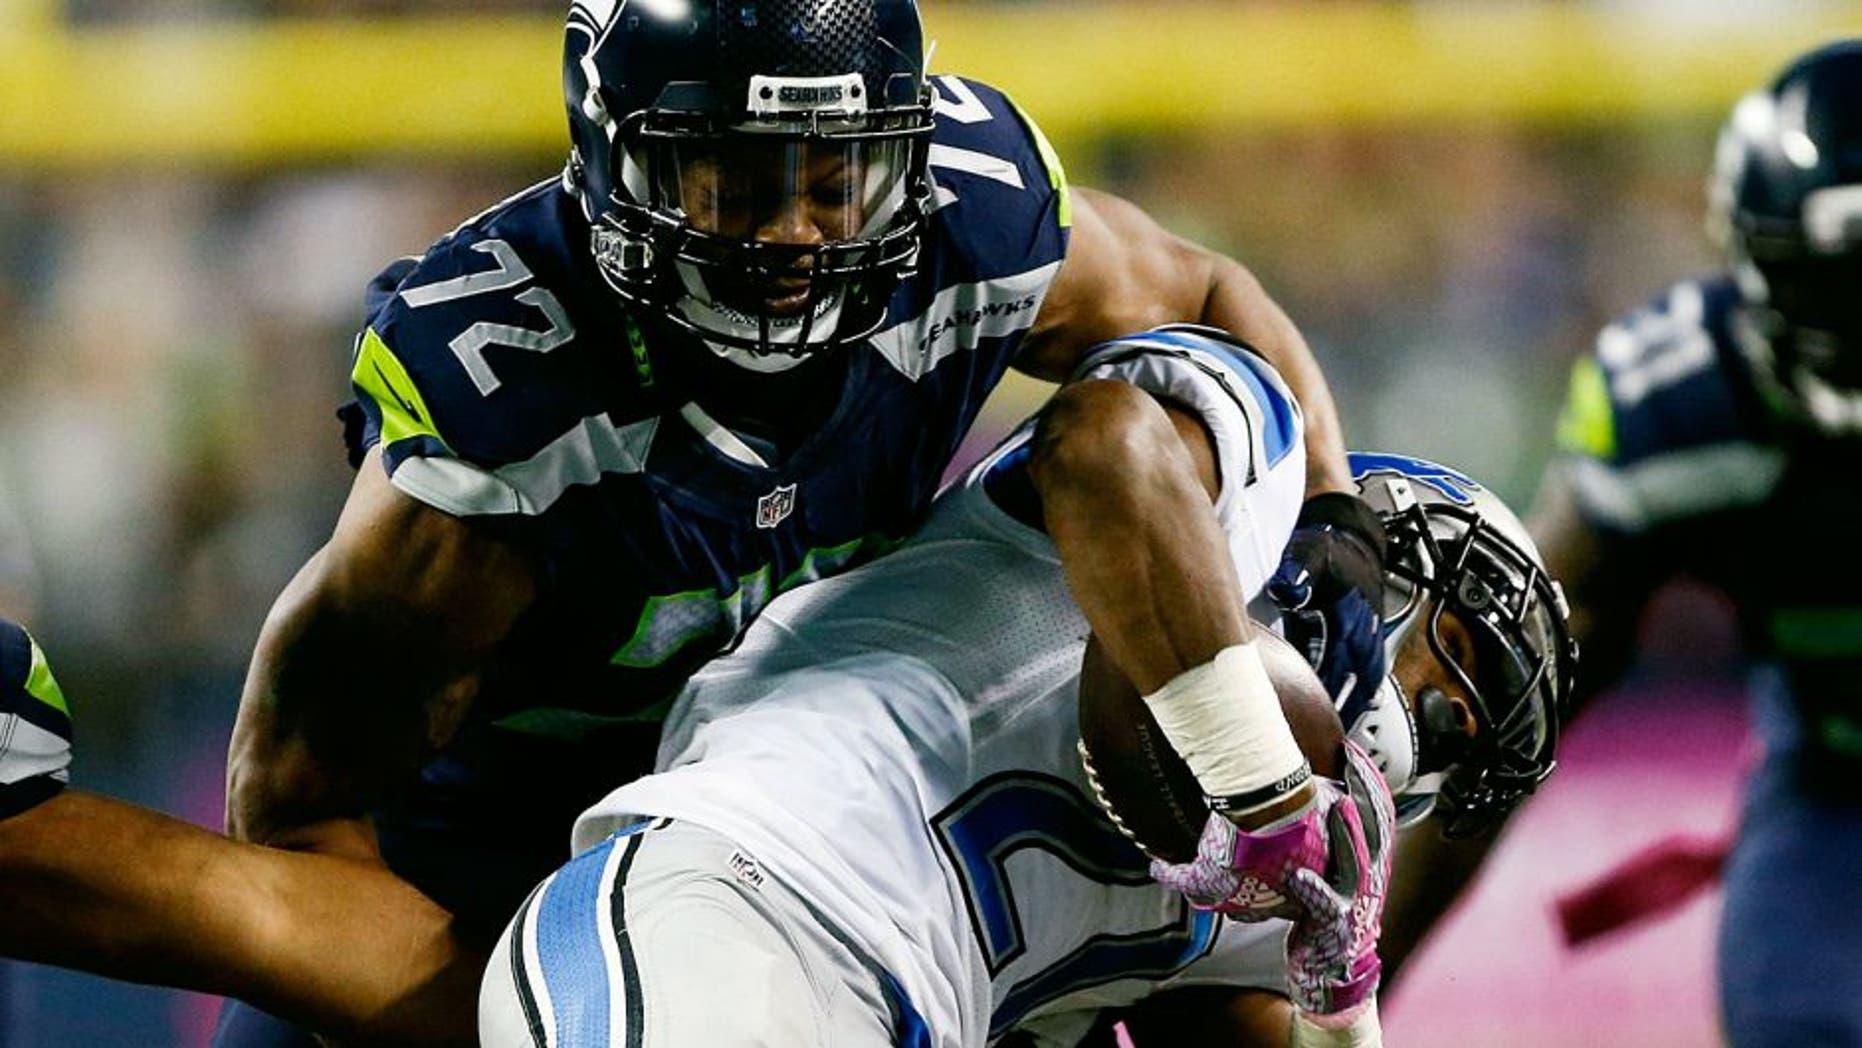 Oct 5, 2015; Seattle, WA, USA; Seattle Seahawks defensive end Michael Bennett (72) tackles Detroit Lions running back Ameer Abdullah (21) during the third quarter at CenturyLink Field. Mandatory Credit: Joe Nicholson-USA TODAY Sports